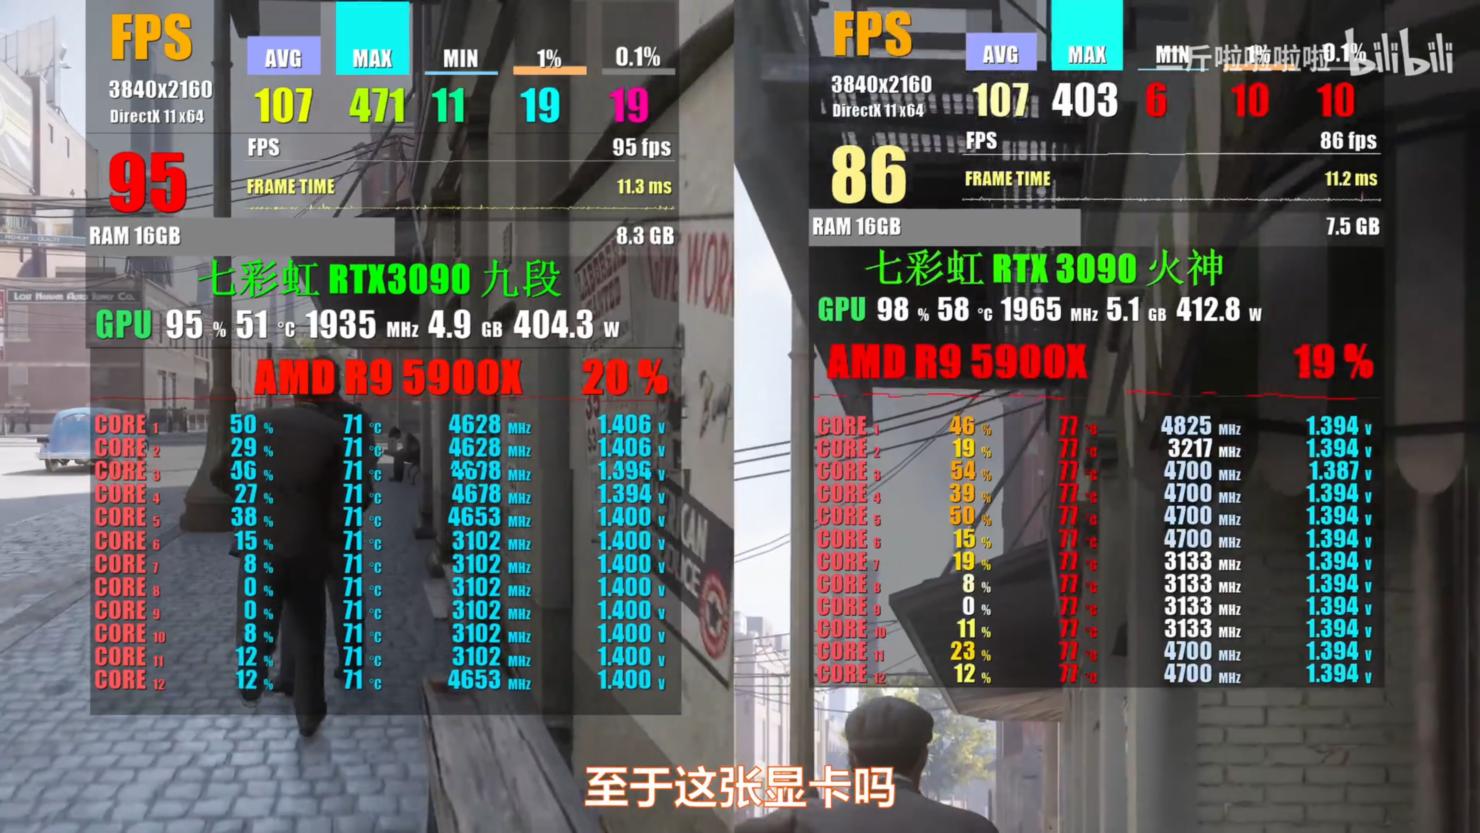 colorful-igame-geforce-rtx-3090-kudan-graphics-card-benchmarks-_6